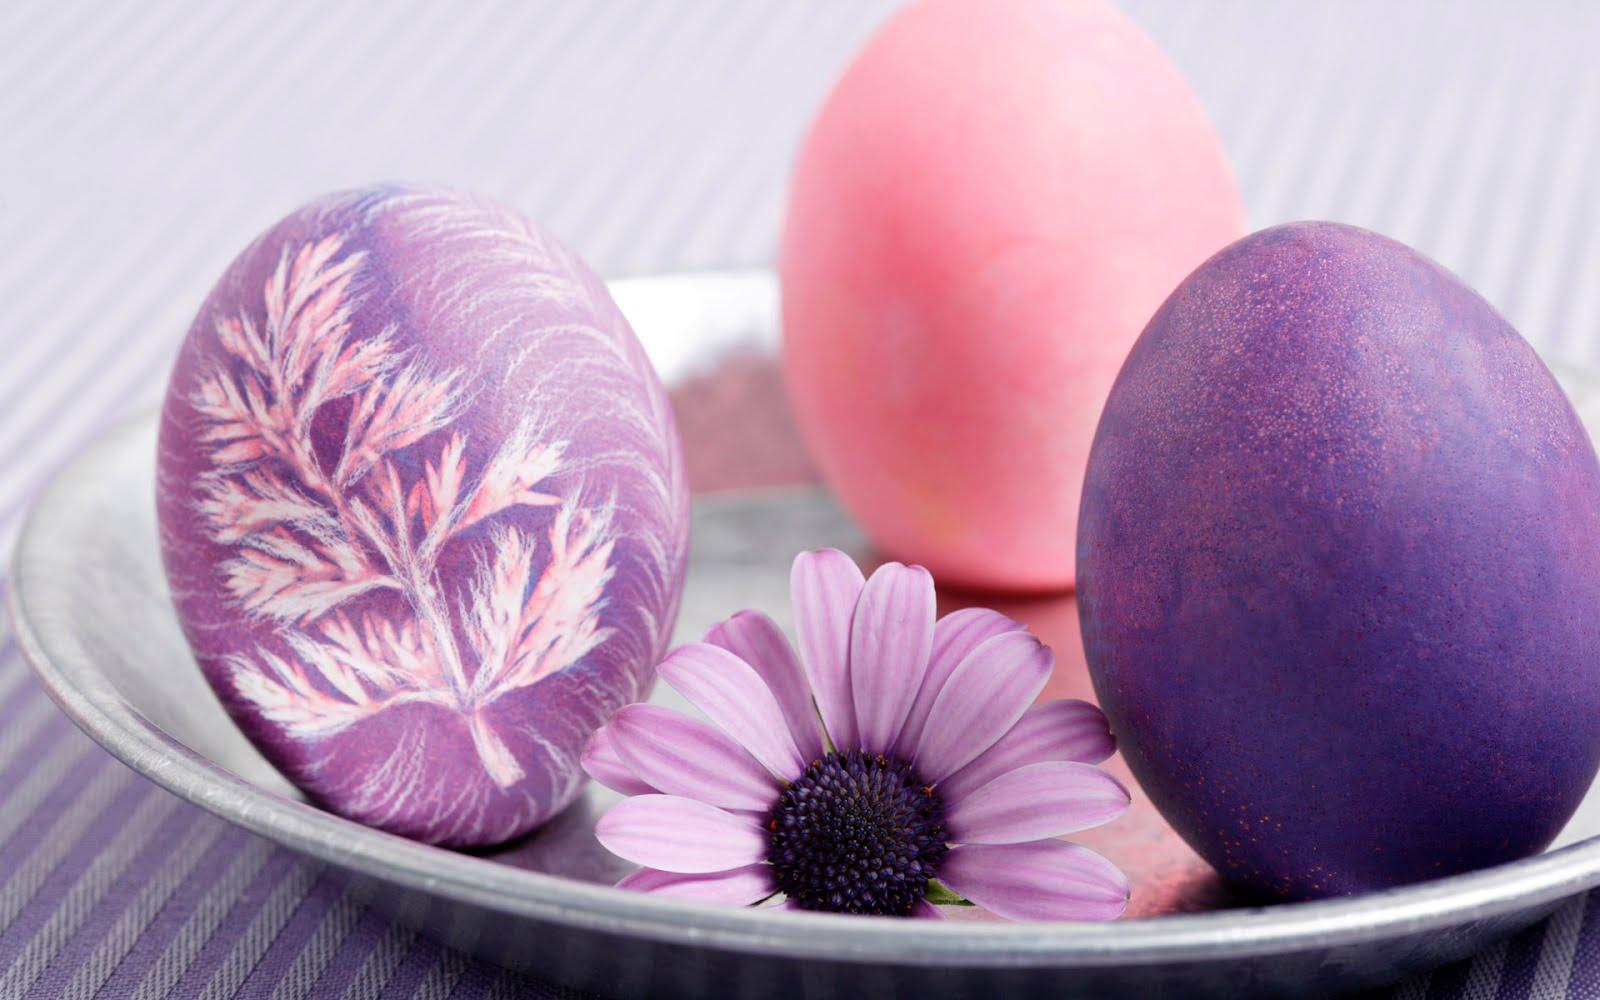 Aravind 3d Wallpapers Easter Eggs Decorations Colorful Easter Eggs Wallpapers